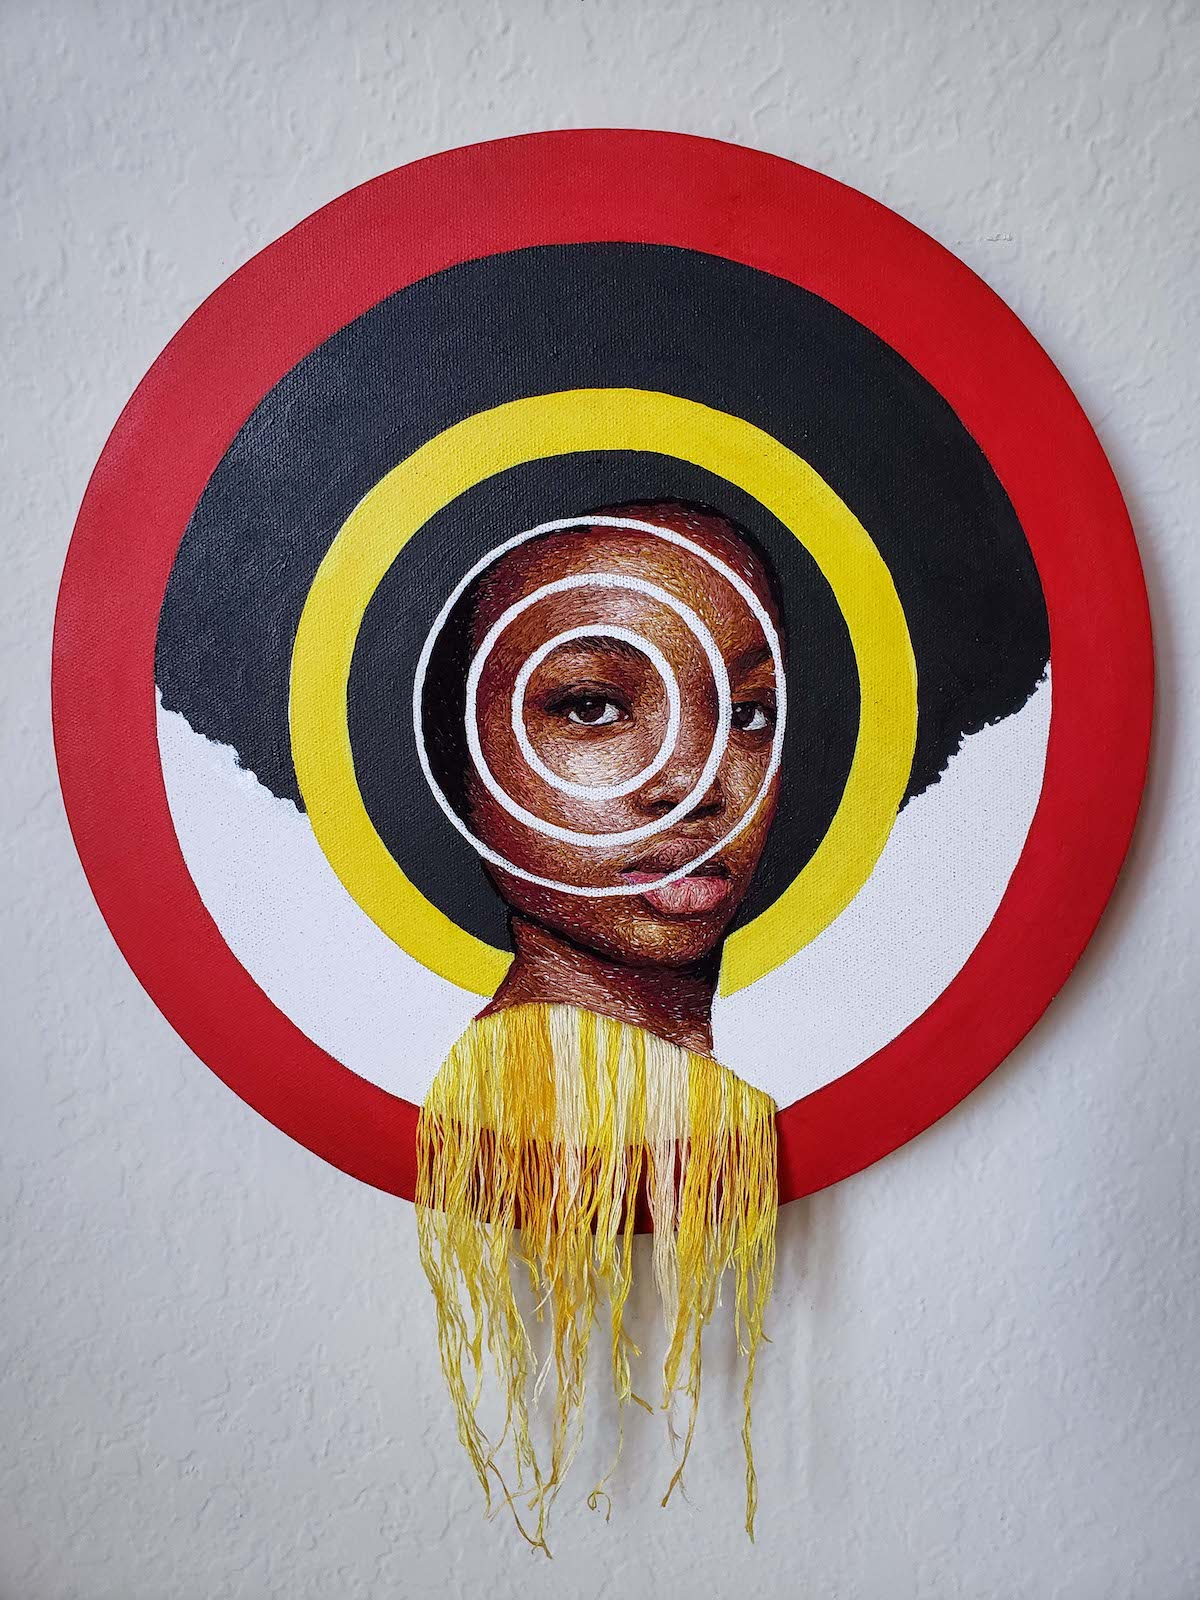 Mixed Media Portrait by Nneka Jones